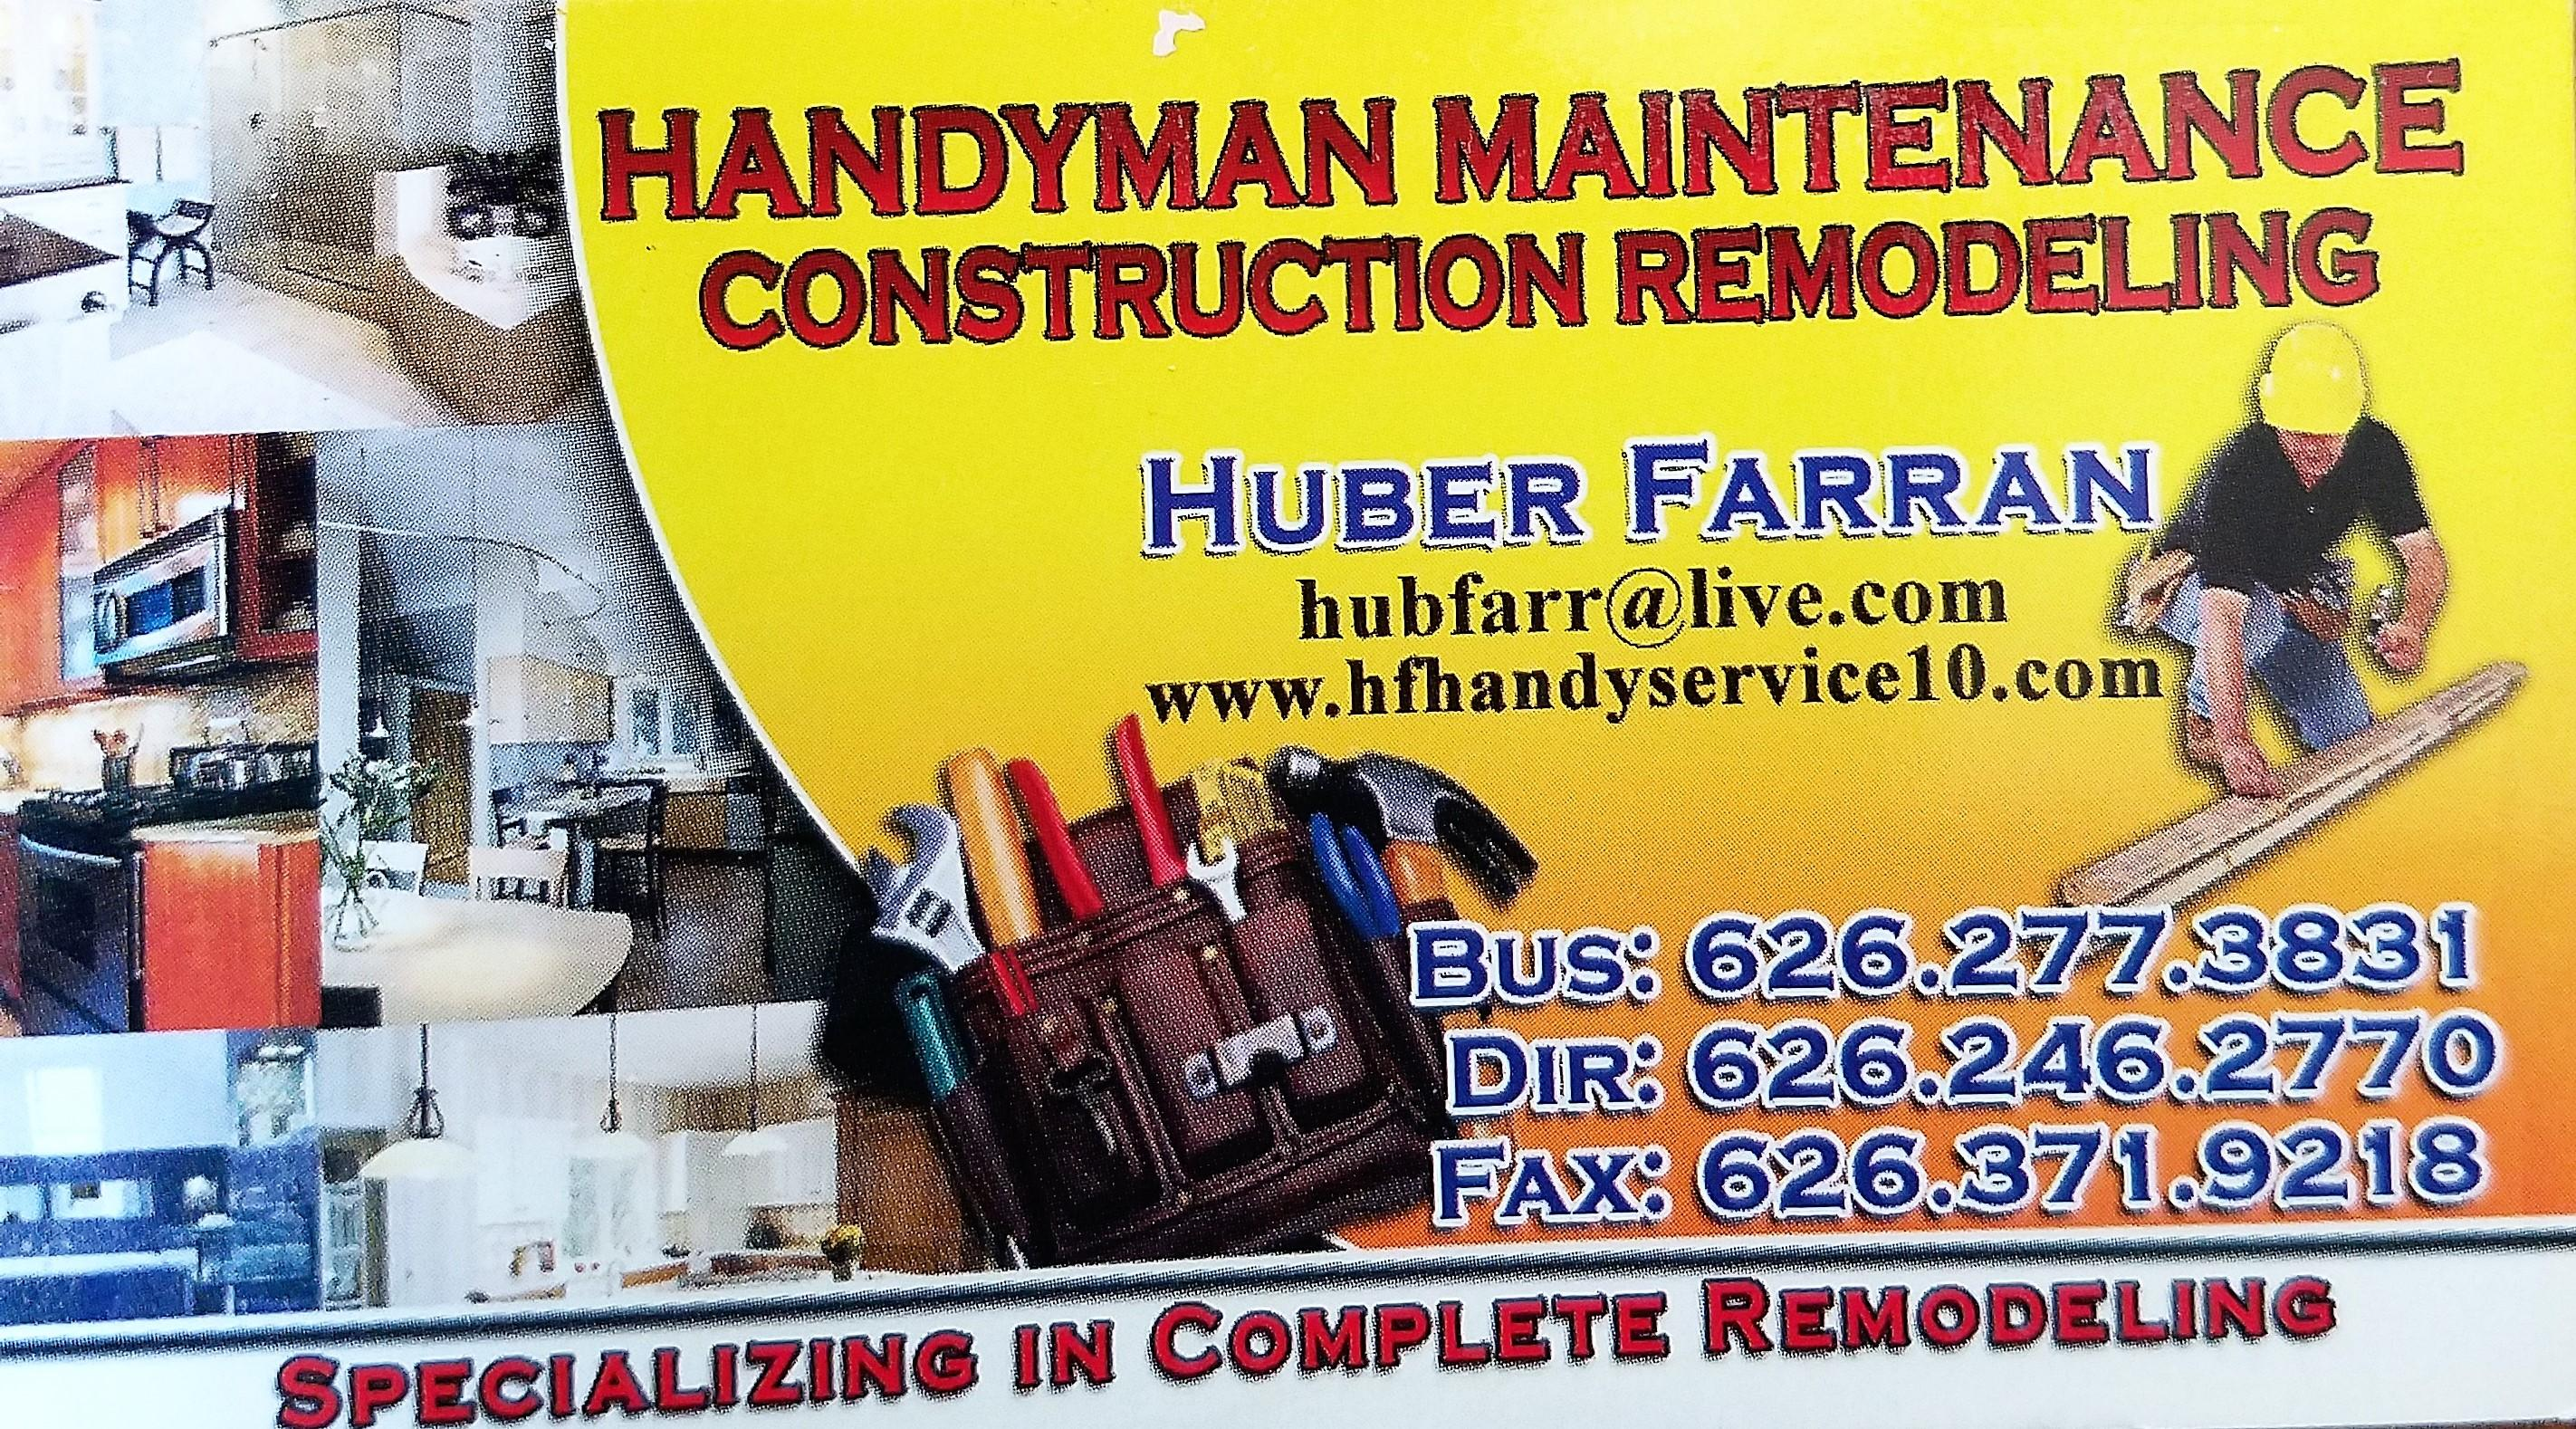 HANDYMAN MAINTENANCE CONSTRUCTION & REMODELING